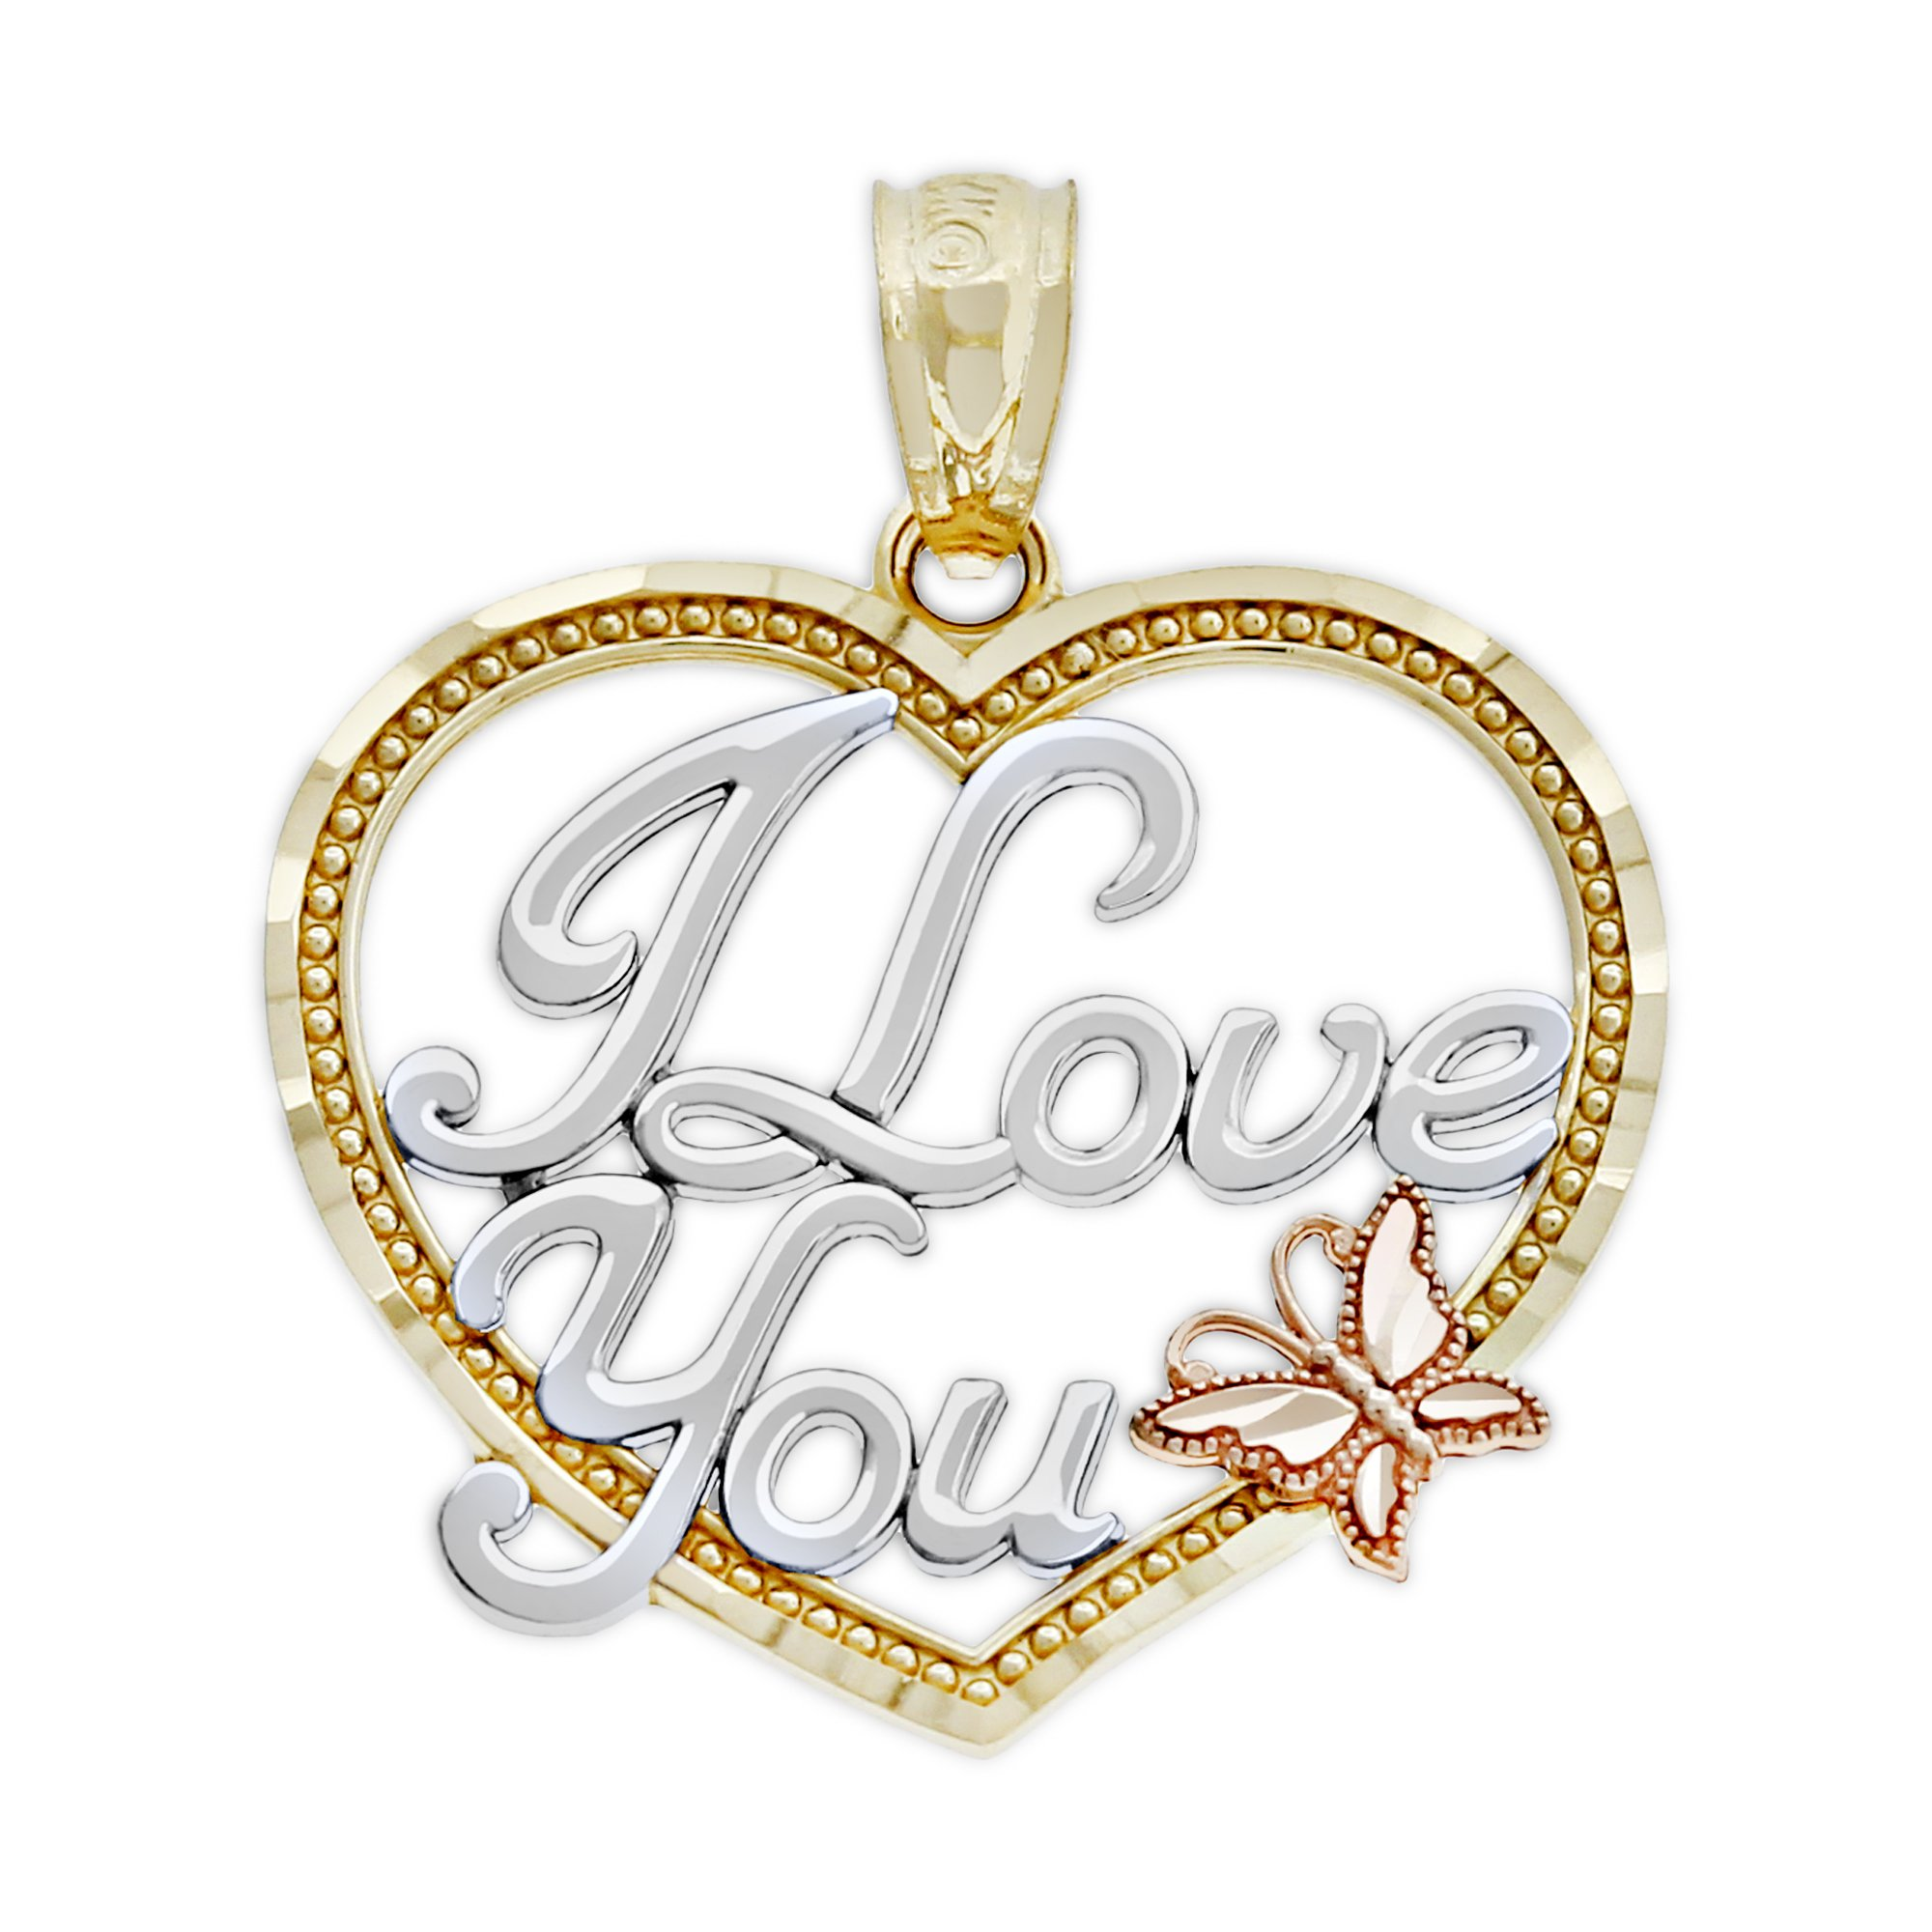 Charm America - Gold I Love You Heart Charm - 14 Karat Solid Gold